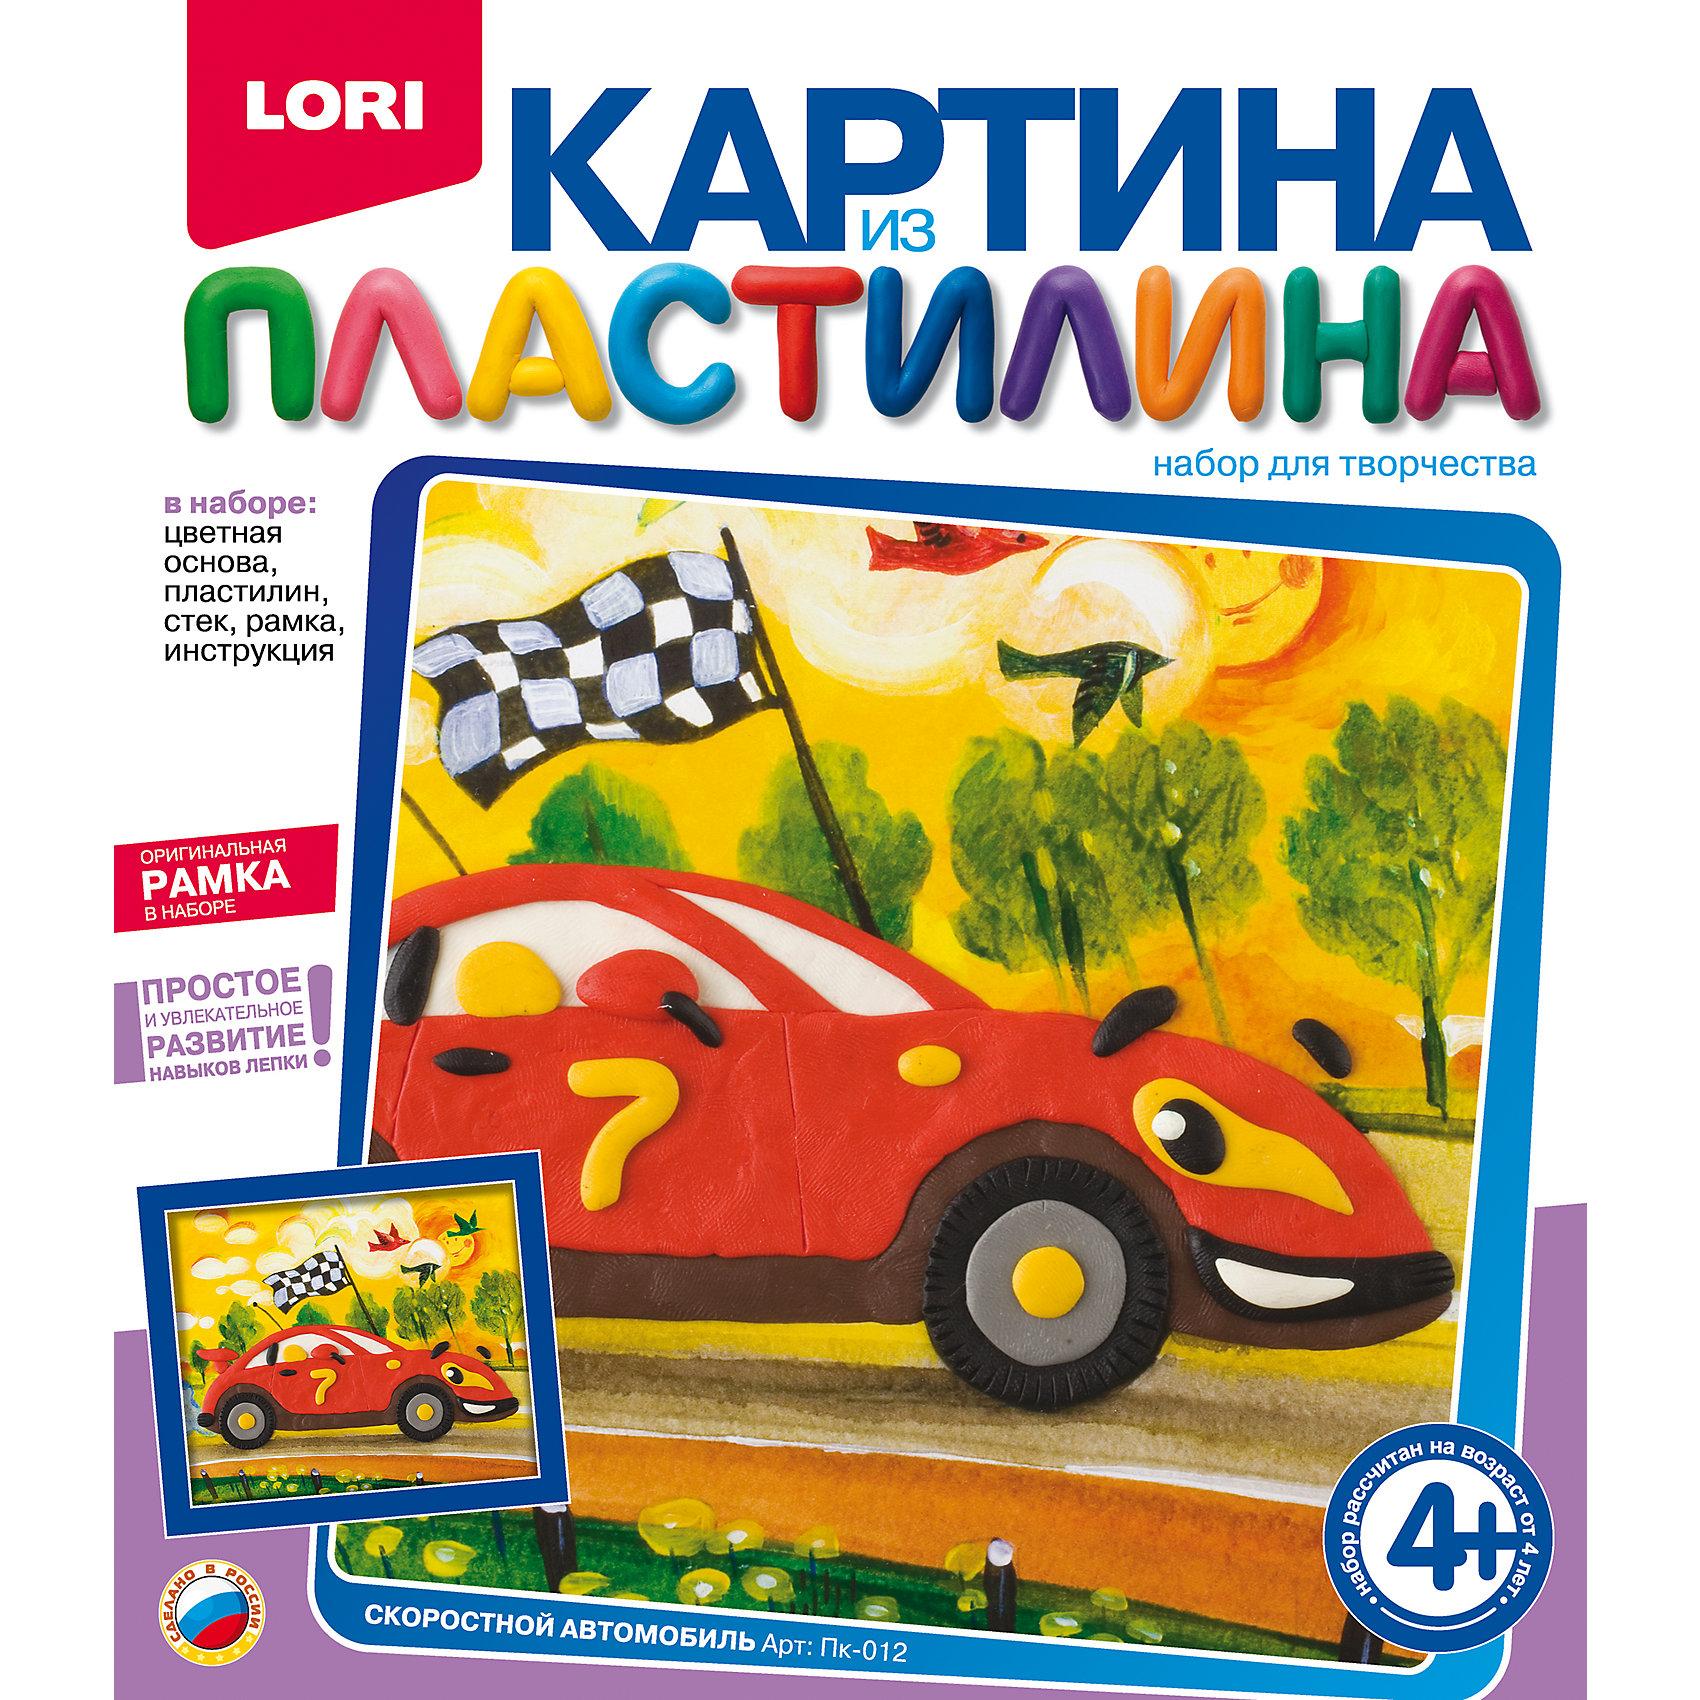 LORI Картина из пластилина Скоростной автомобиль lori картина из пластилина веселый автомобиль lori